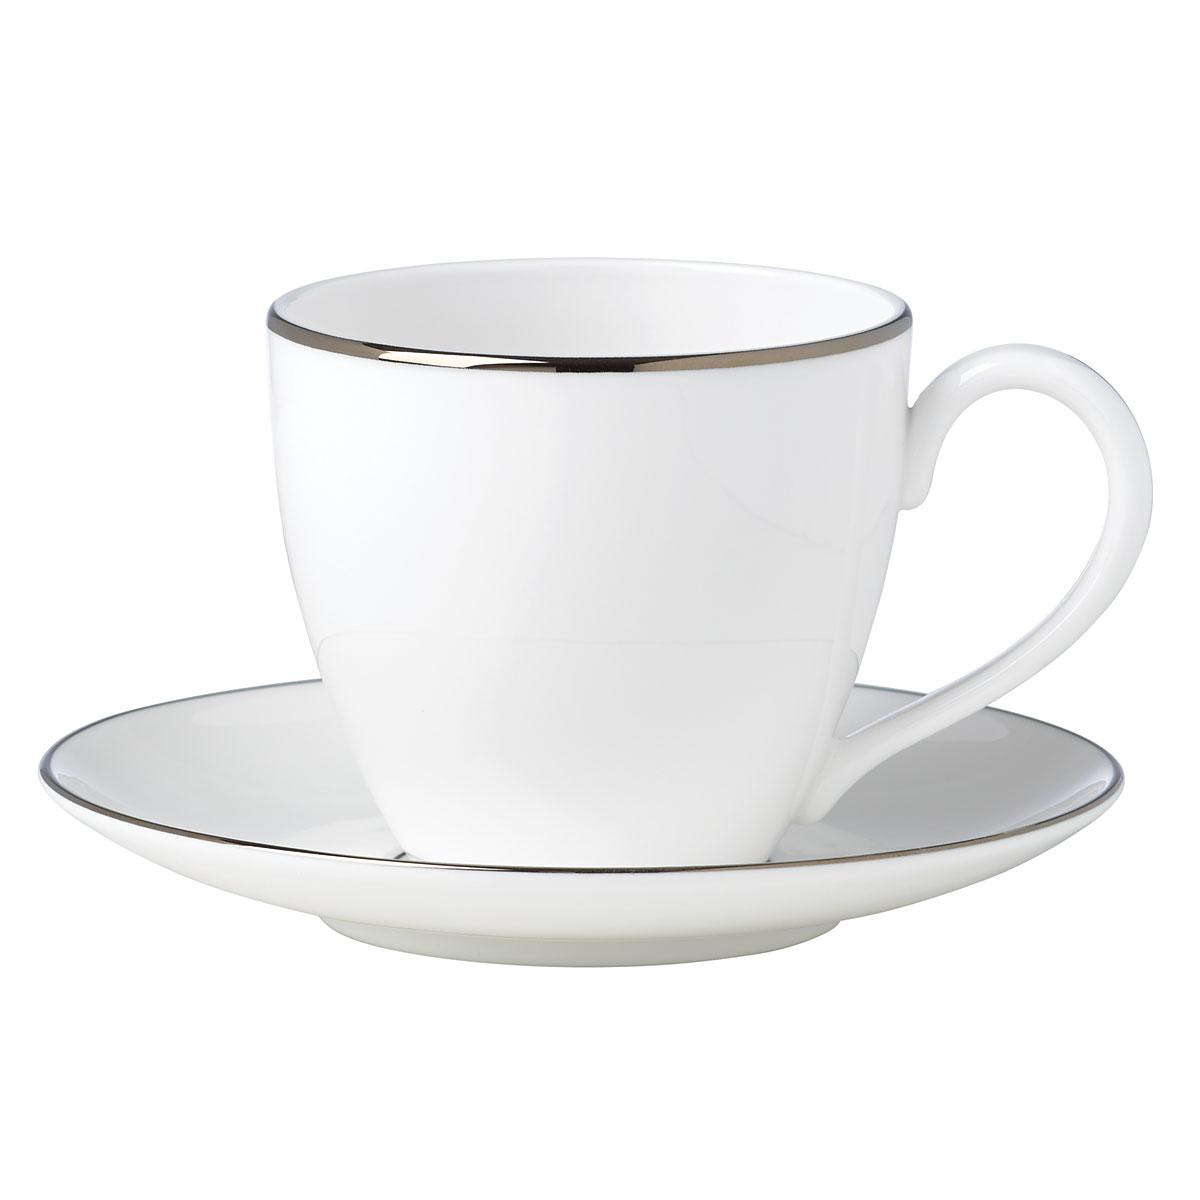 Lenox Continental Dining Platinum Dinnerware Tea Cup And Saucer